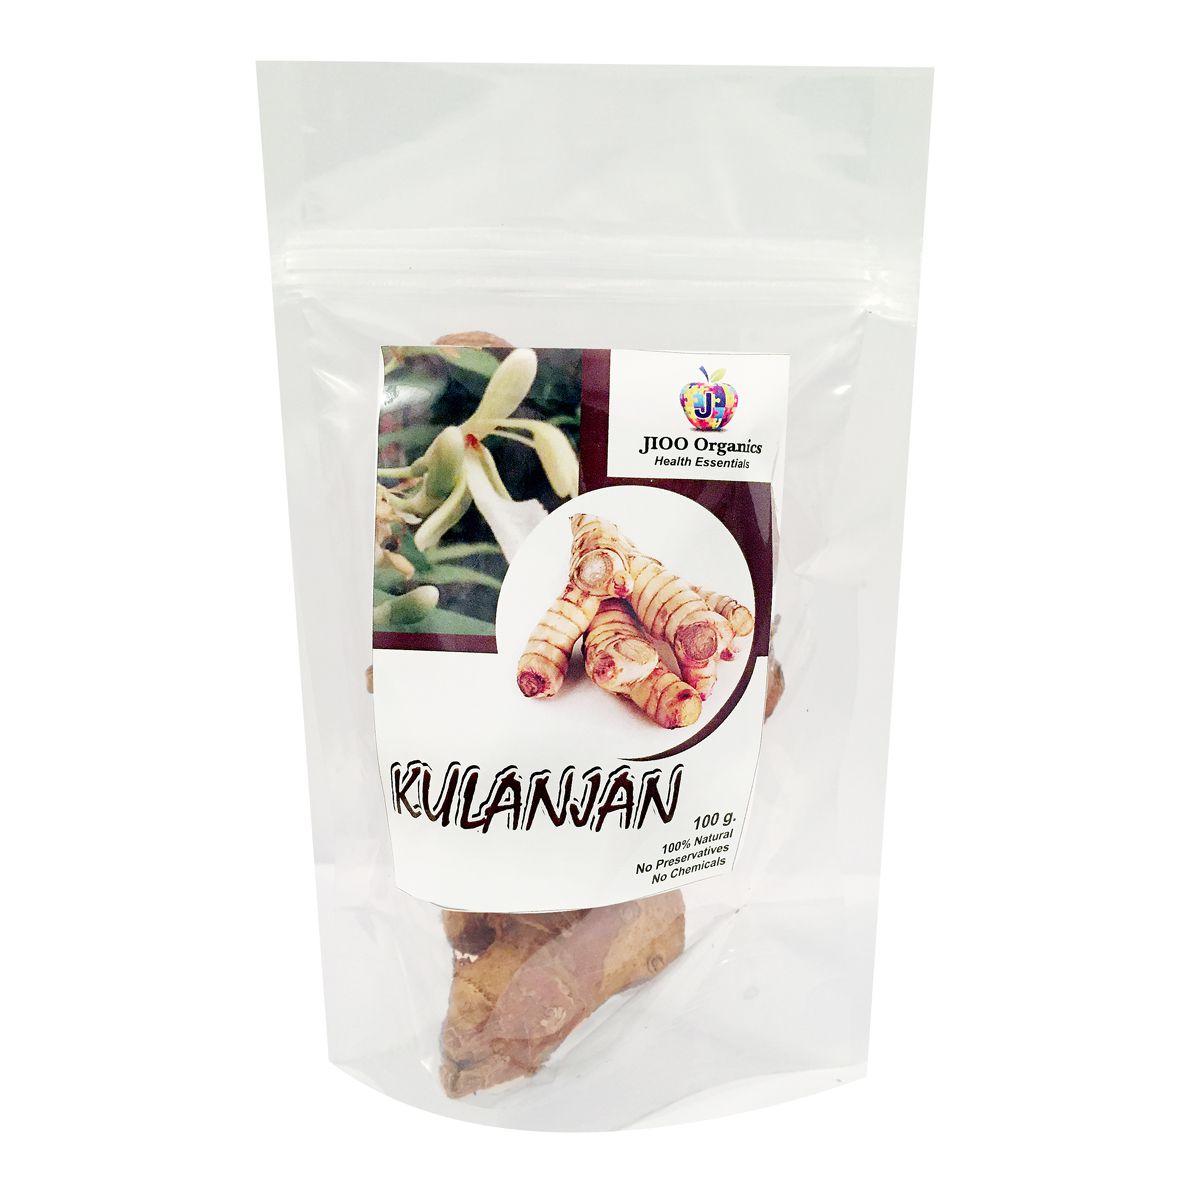 Jioo Organics 100% Natural Premium Kulanjan Raw Herbs 1 gm